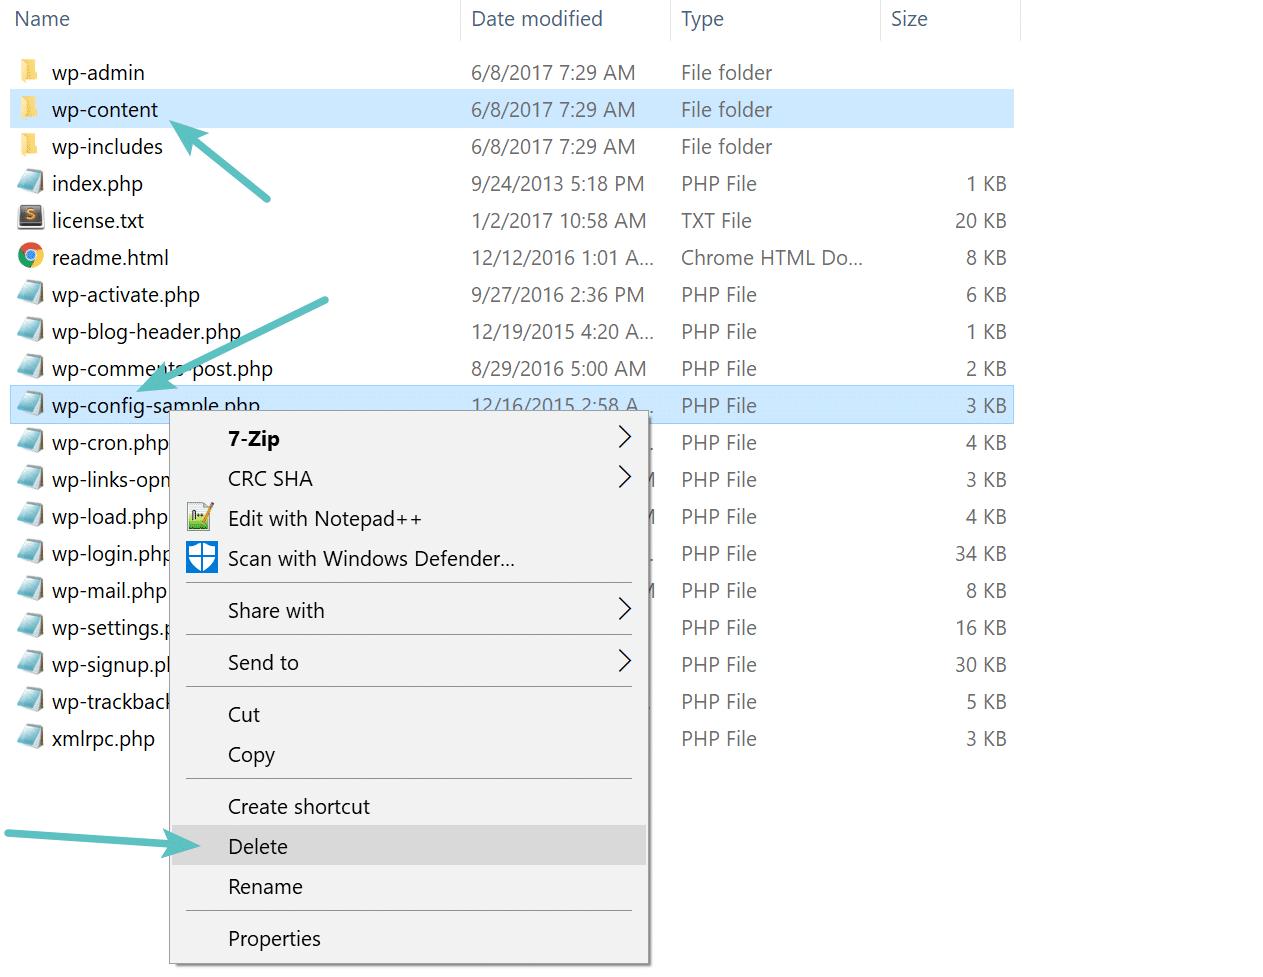 Delete wp-content folder